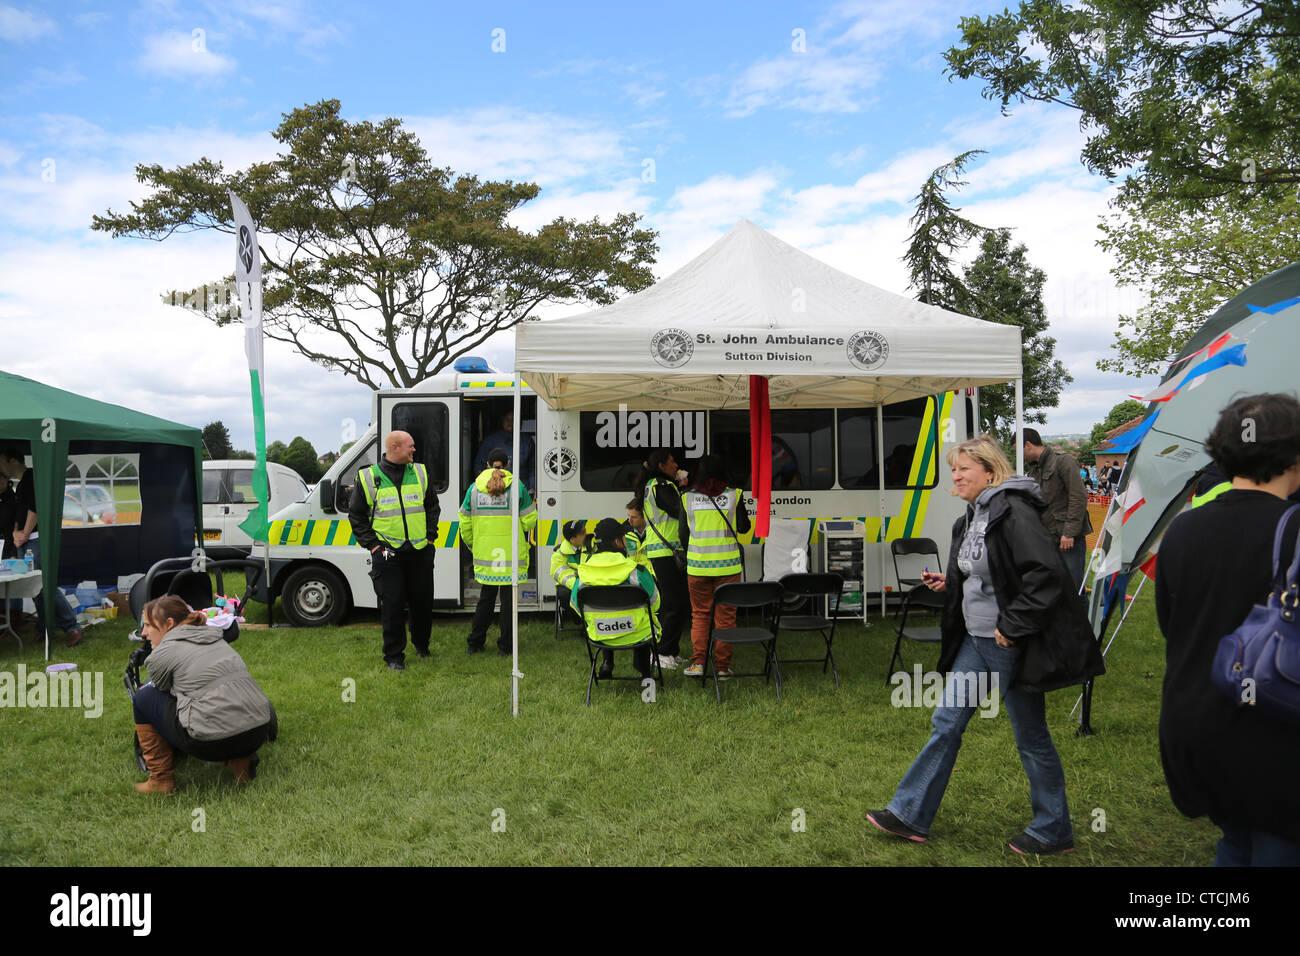 St John's Ambulance Service Cheam Village Fair Surrey England - Stock Image